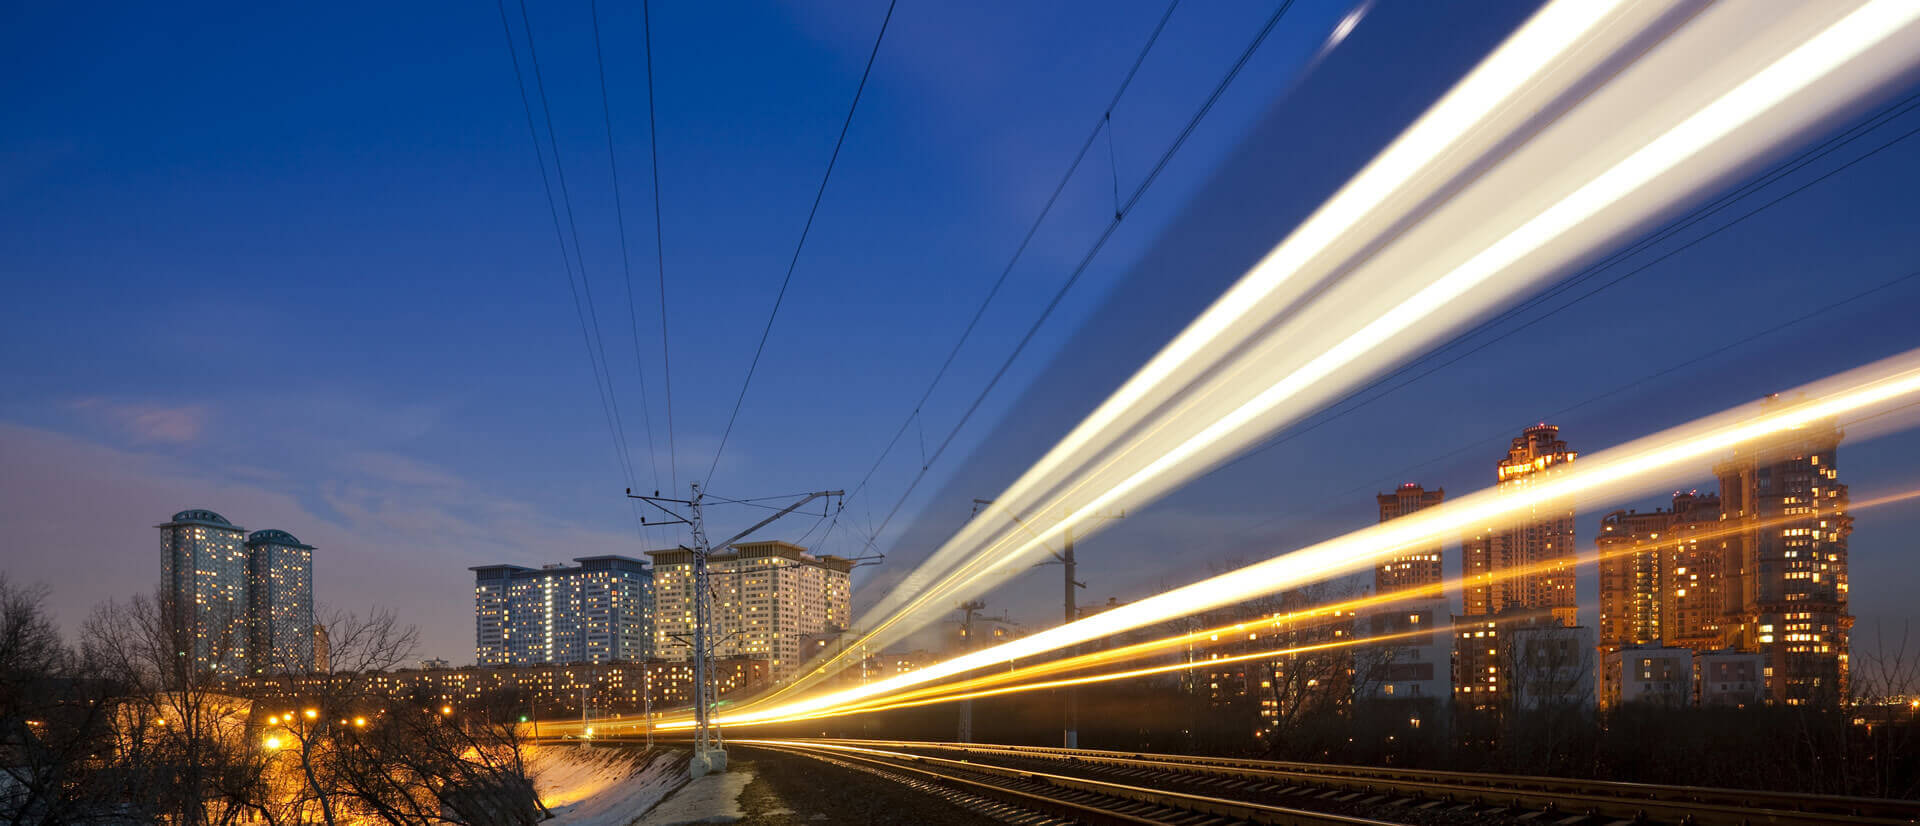 trechnology GmbH I innovating trams, trains & transport